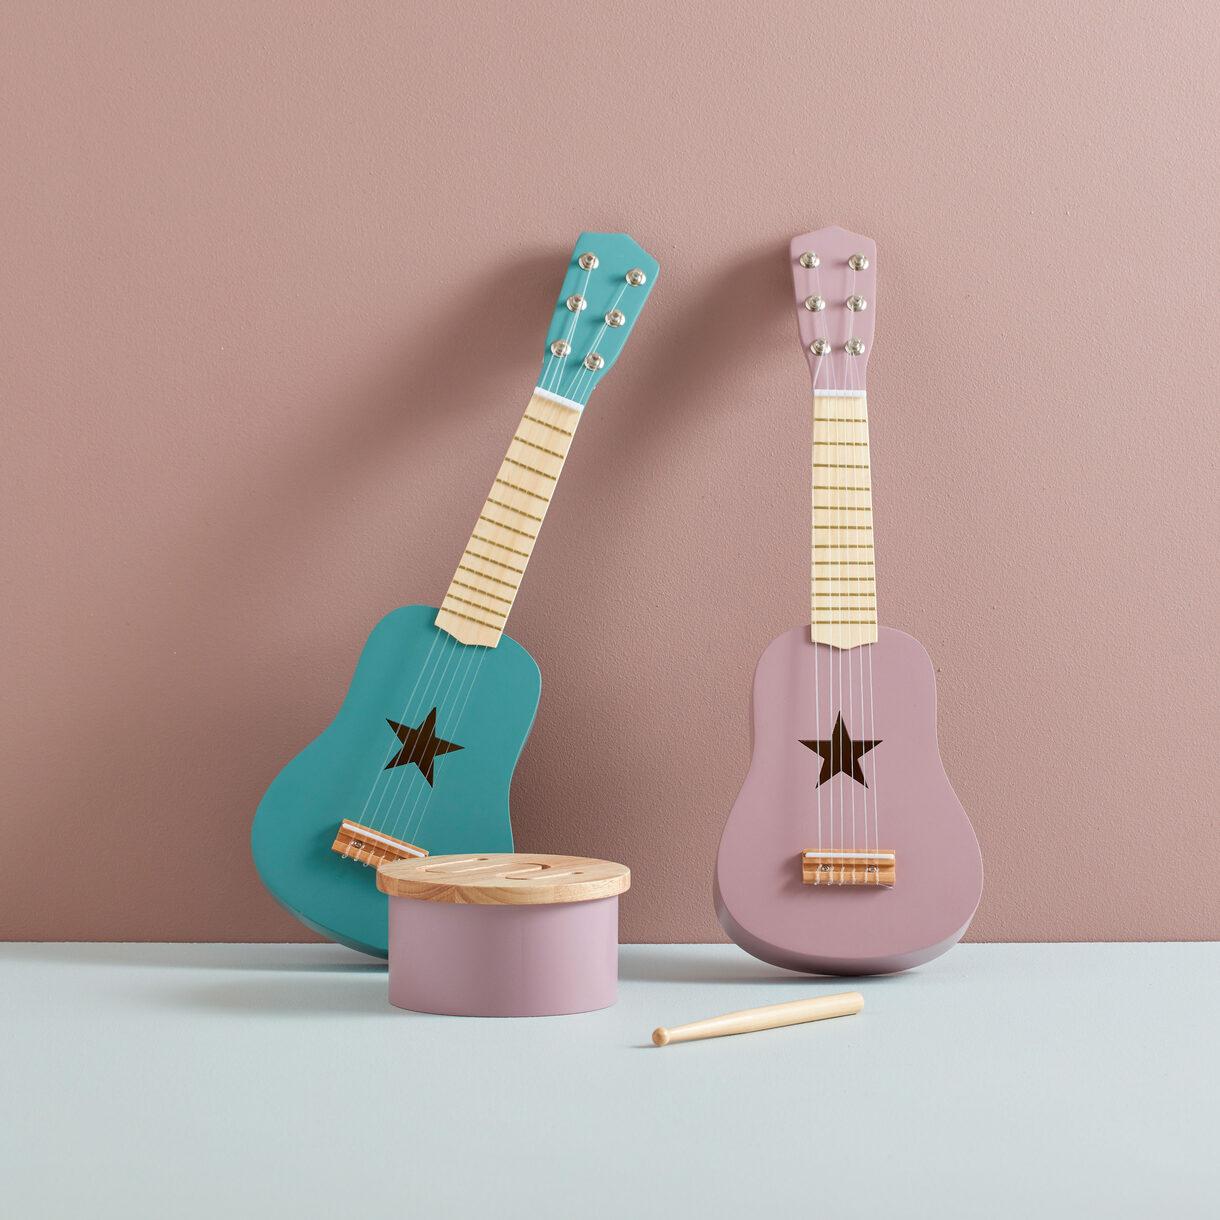 kids concept //木製おもちゃのギター(ライラック)